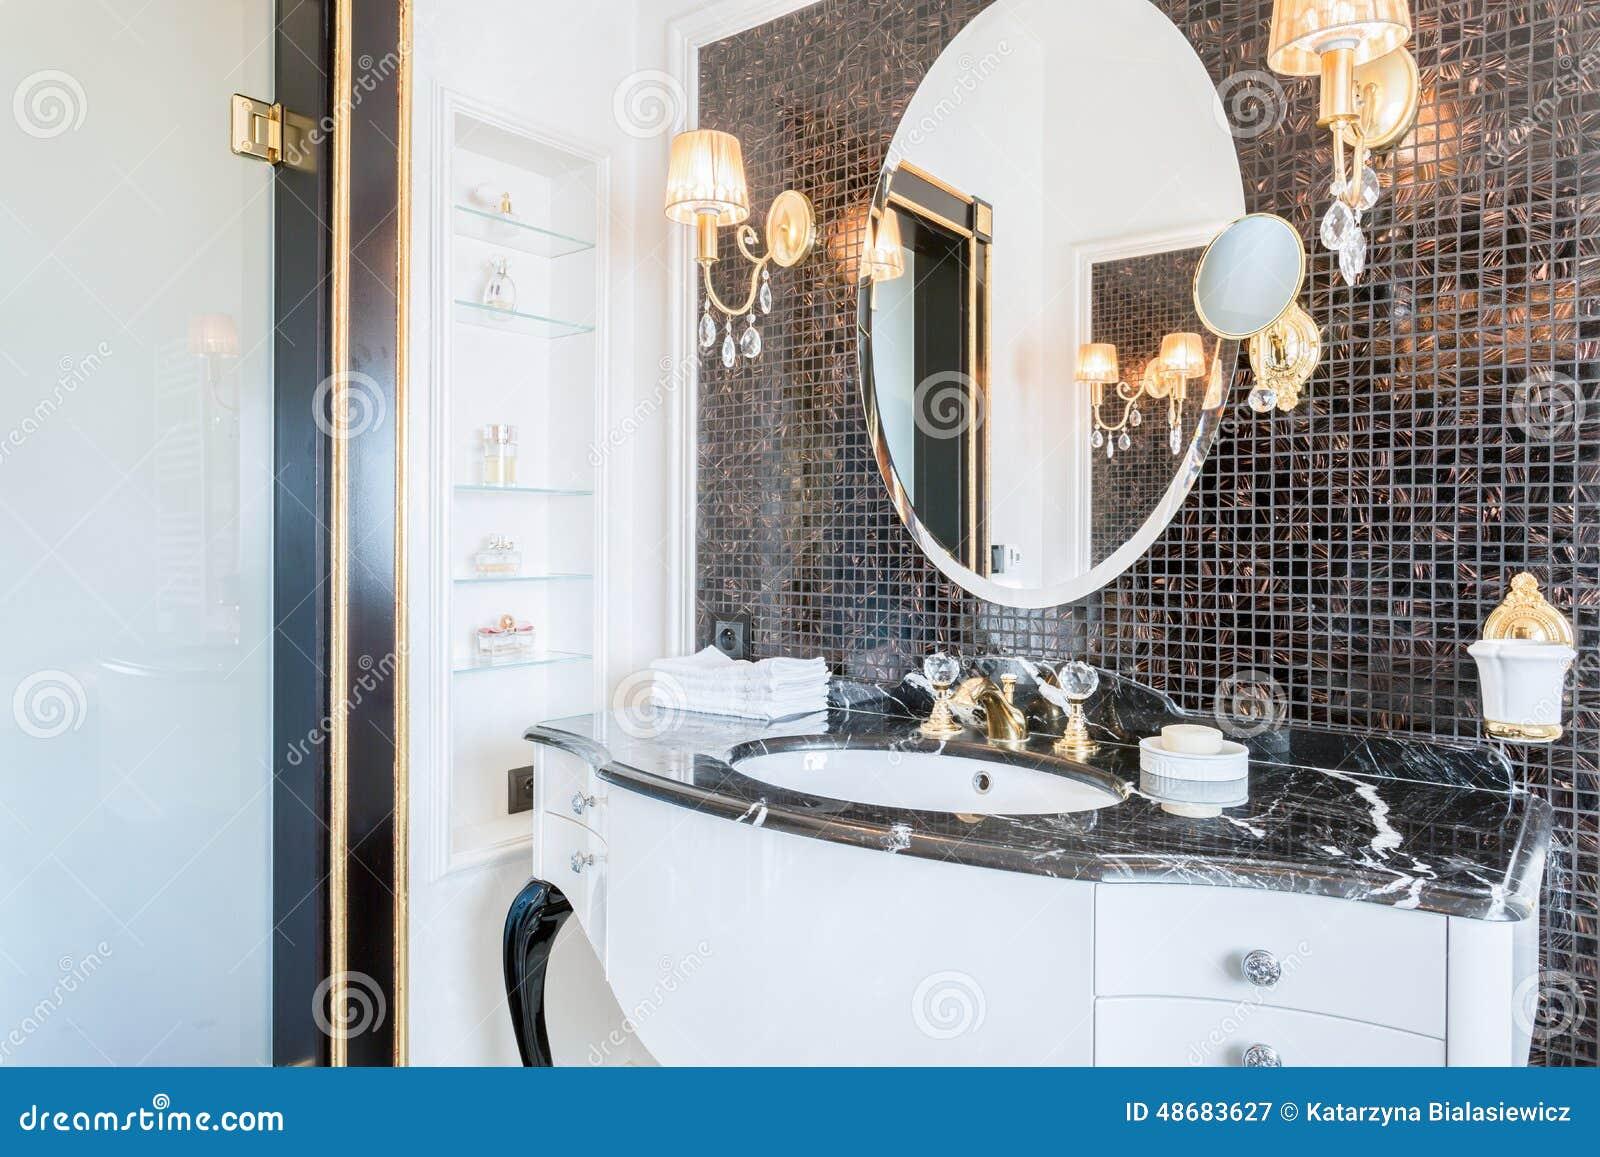 teures schwarzweiss badezimmer - Moderne Badezimmer Schwarz Weiss